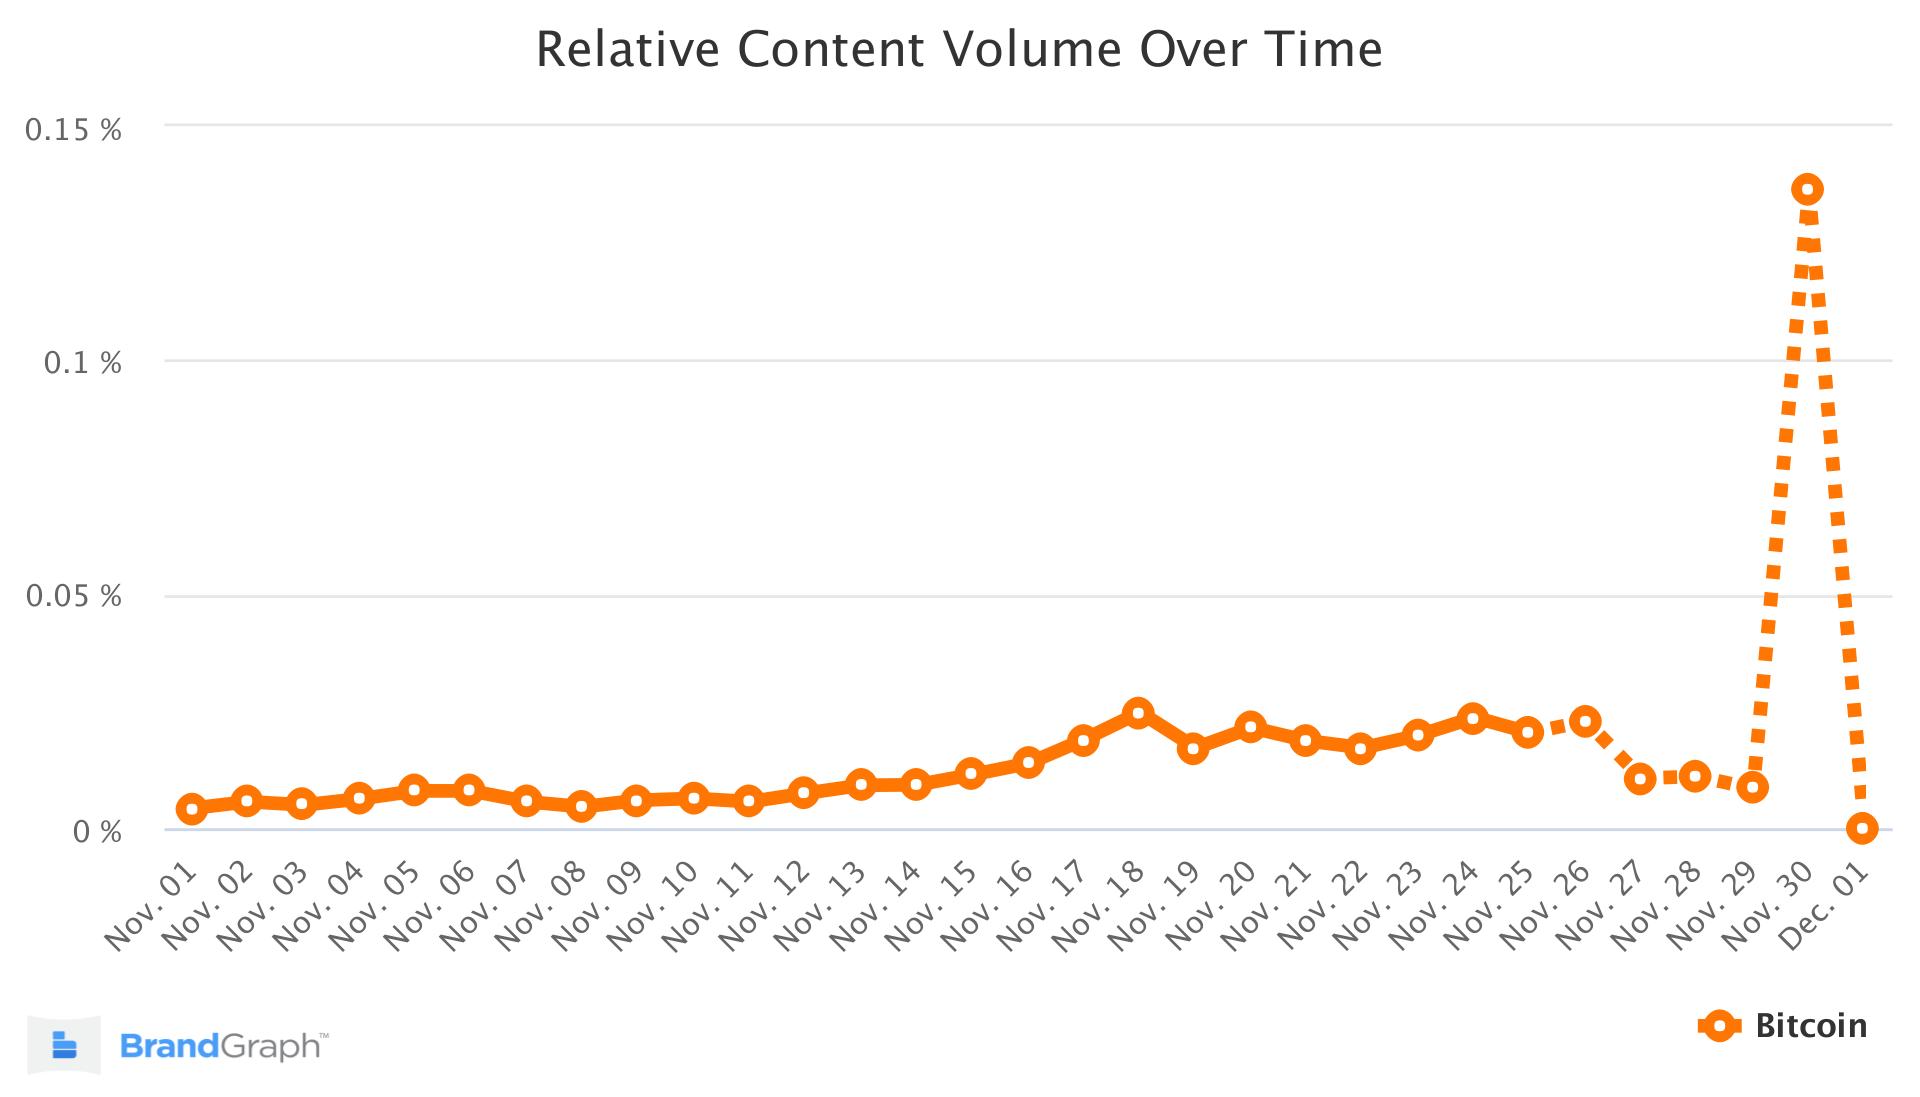 Bitcoin BrandGraph Trend